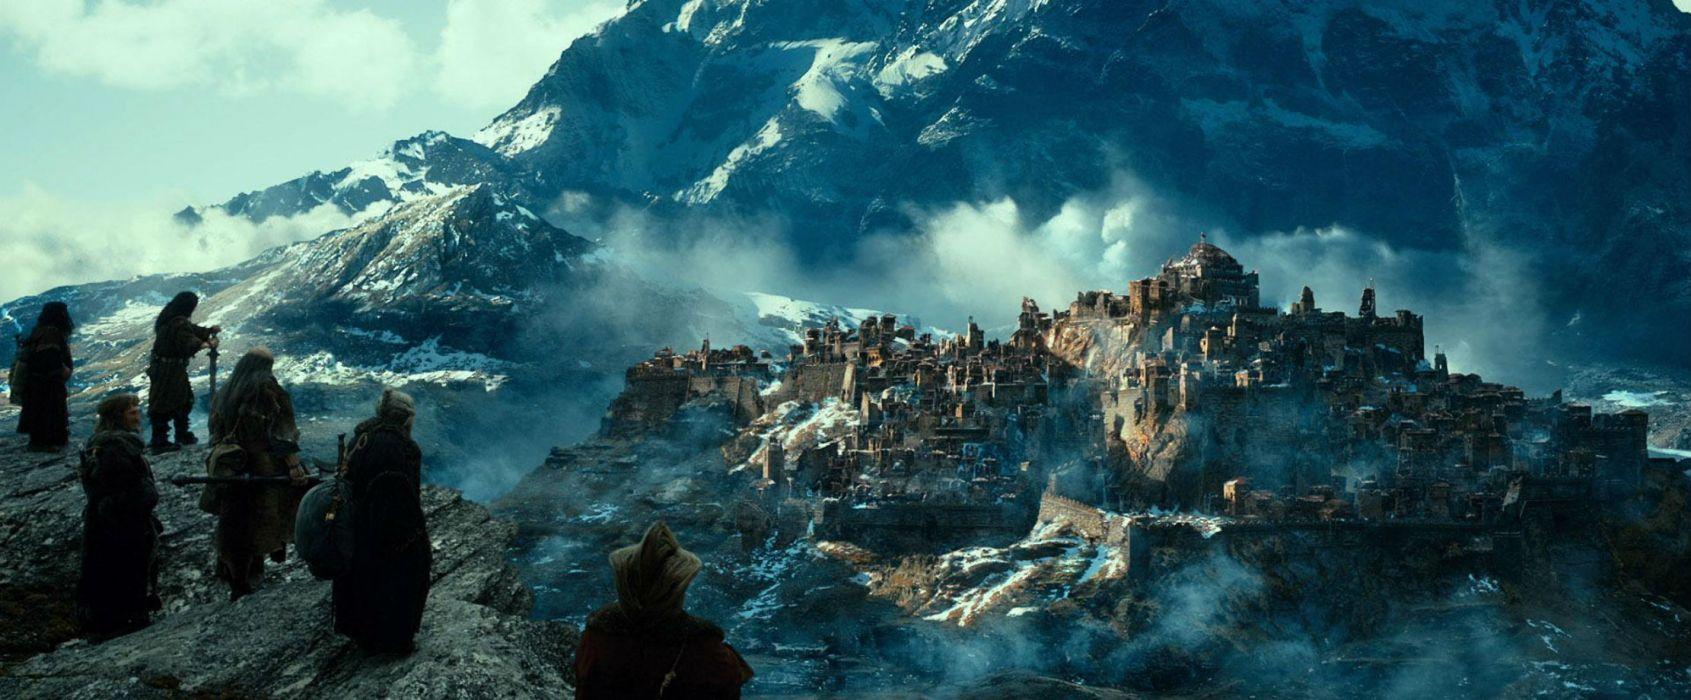 The Hobbit Desolation Of Smaug 2013 fantasy city castle wallpaper